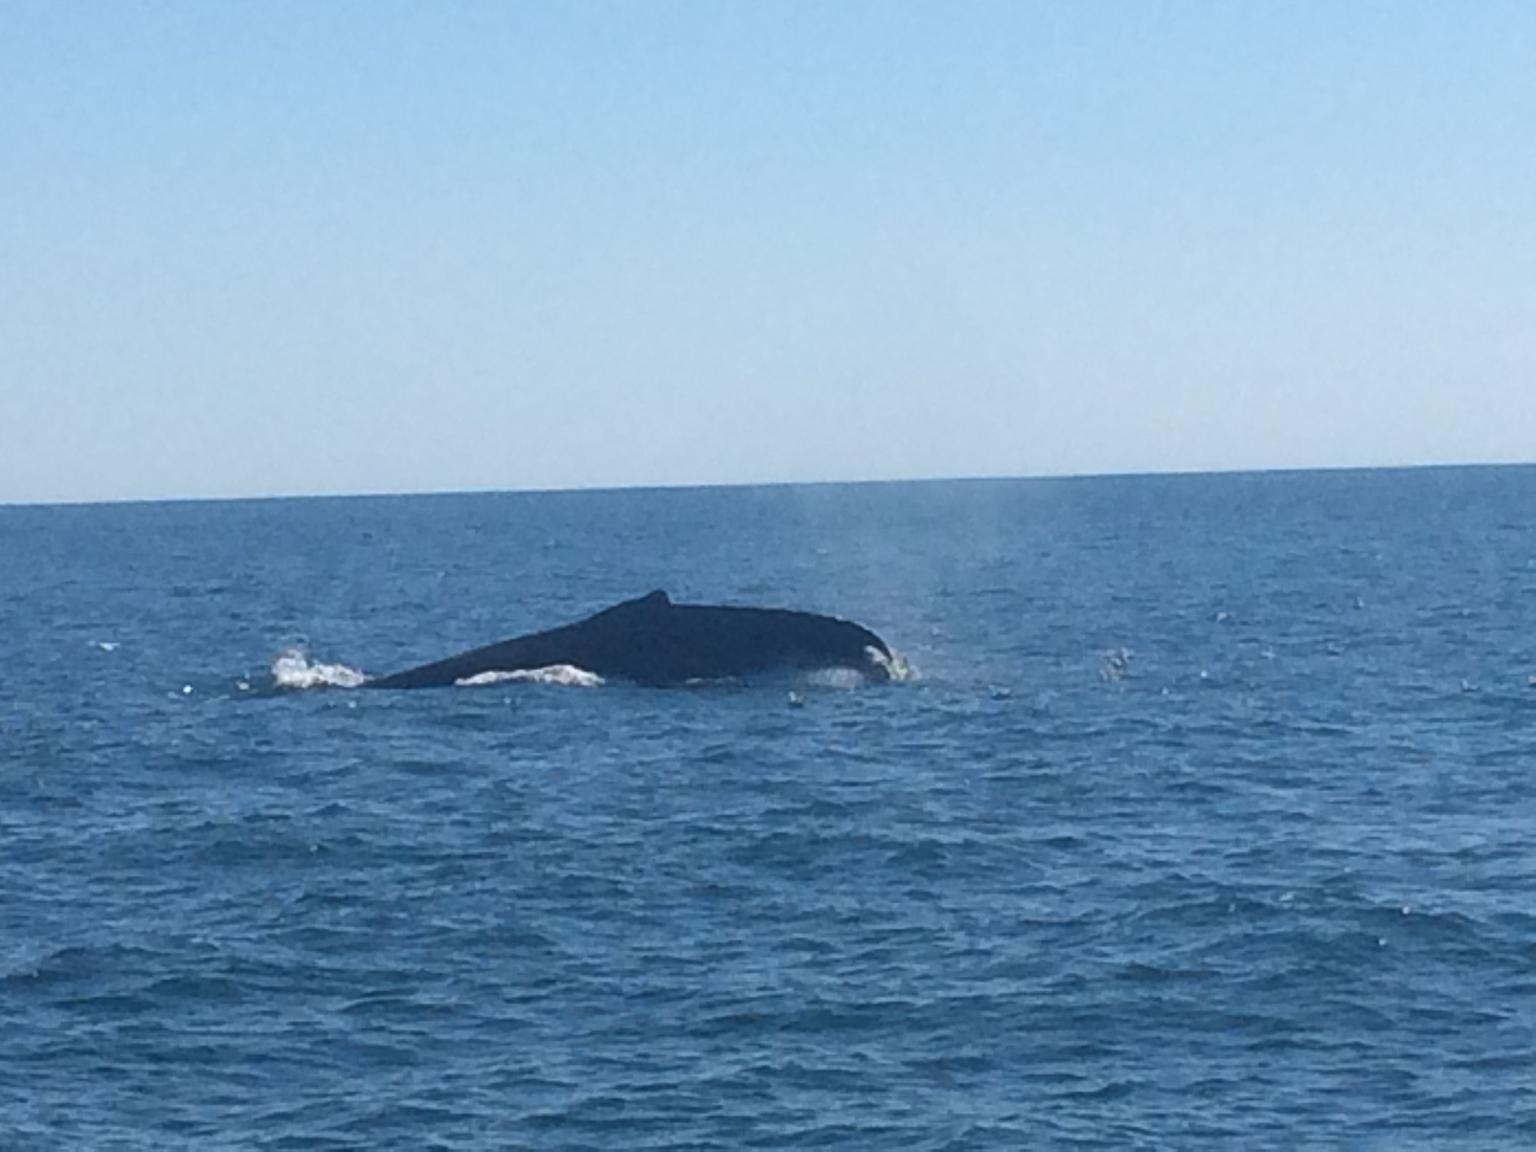 Boston Whale Watching Cruise by High-Speed Catamaran